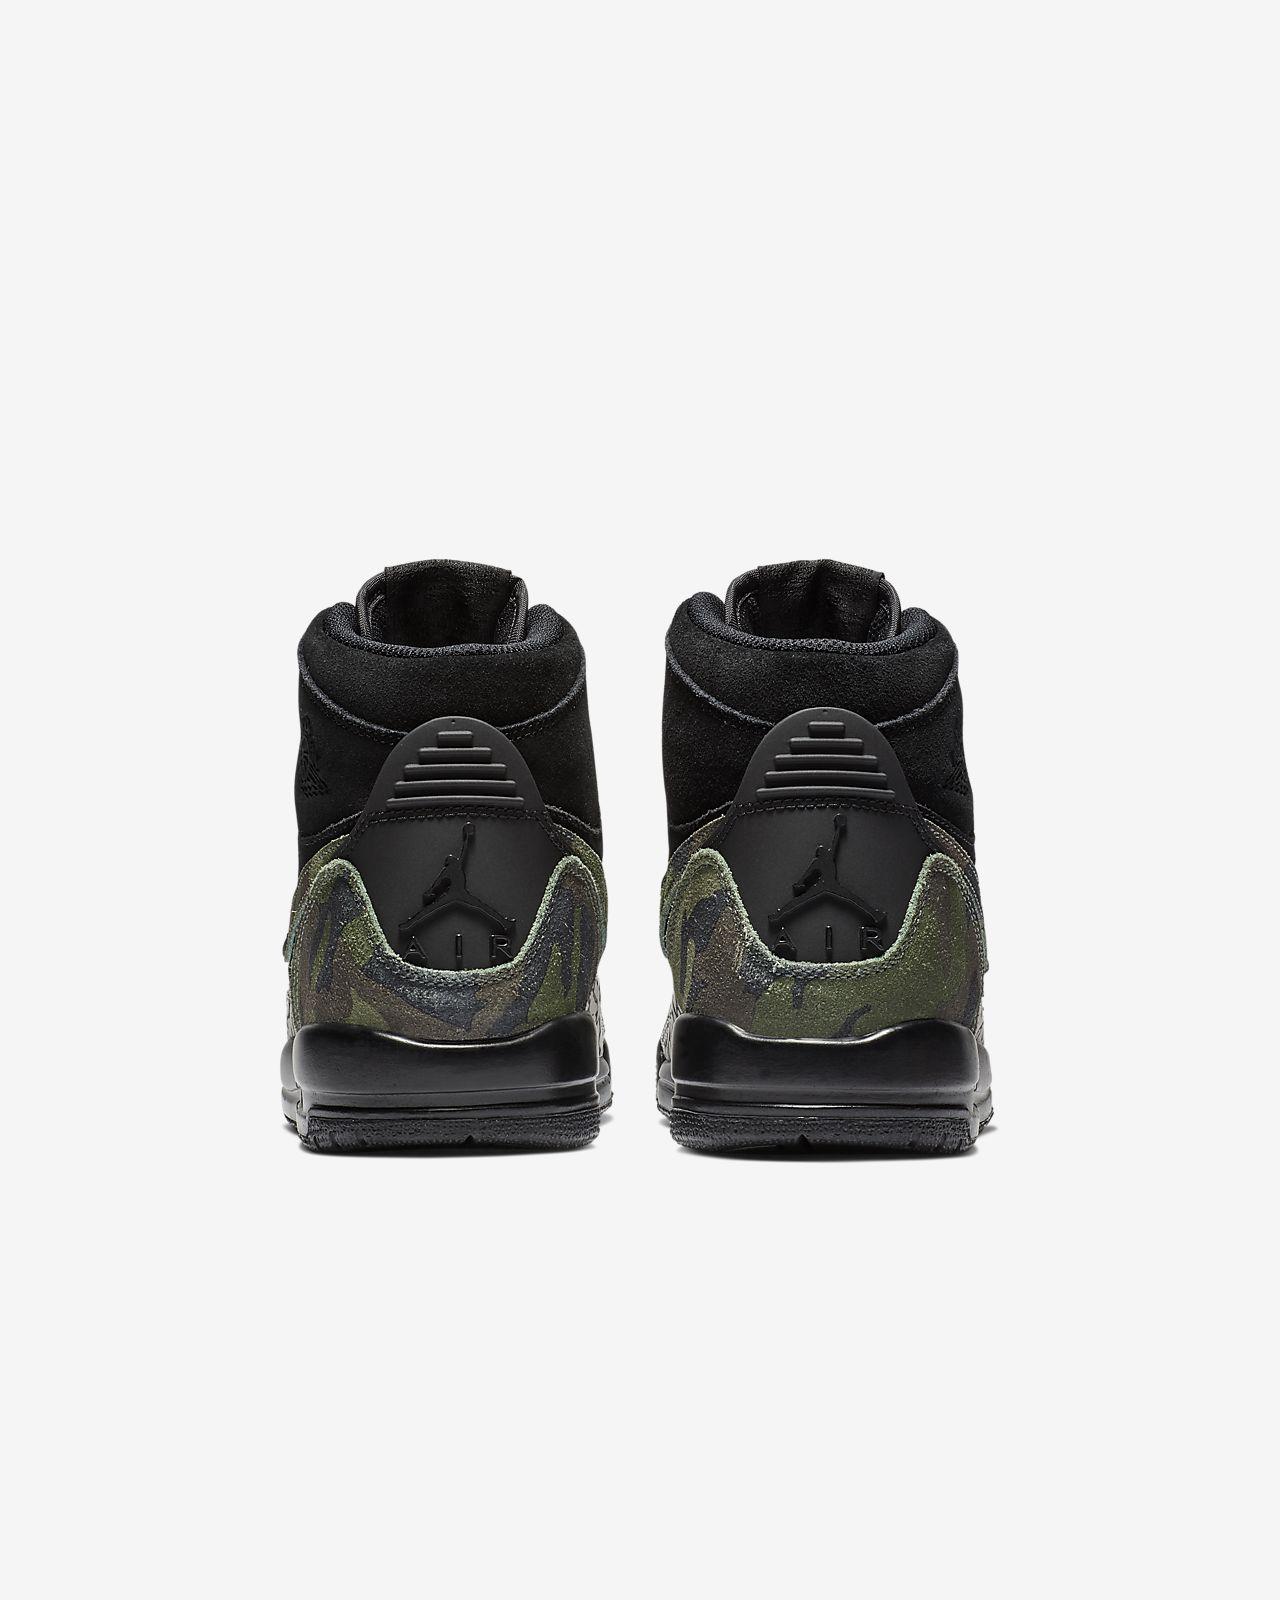 reputable site aead5 22fe8 ... Air Jordan Legacy 312 Big Kids  Shoe